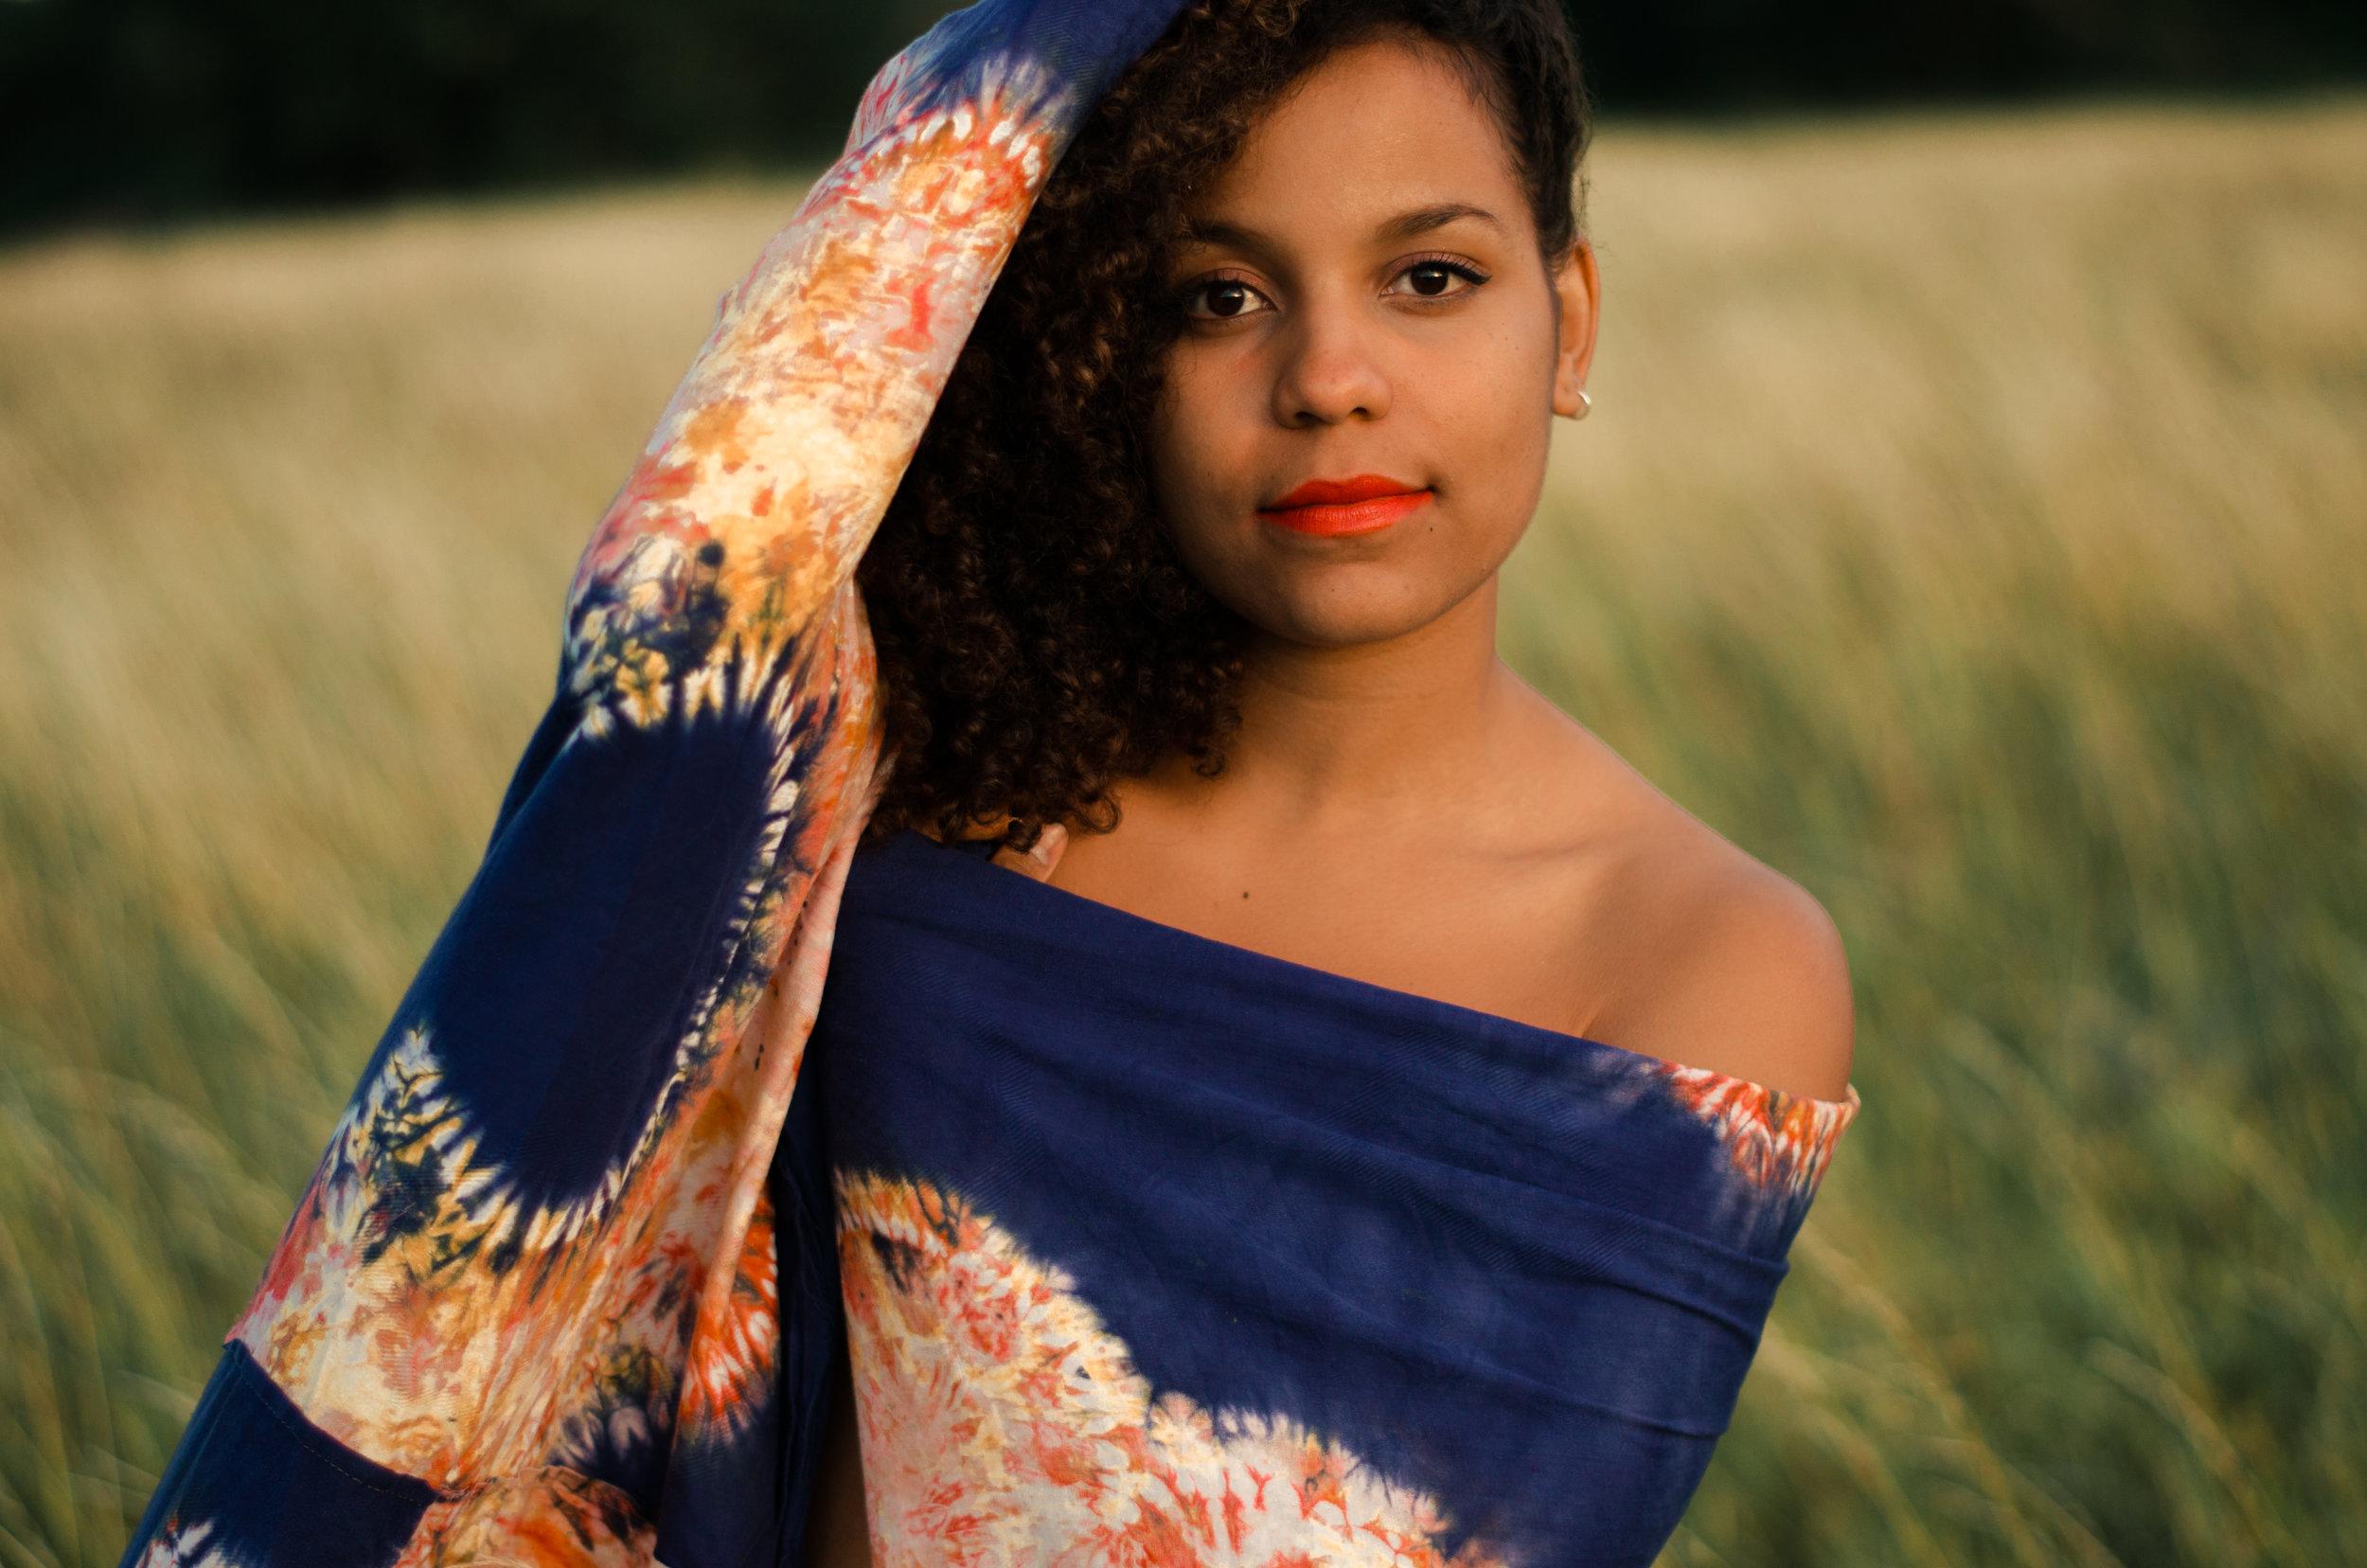 Inka-Portrait-Session-Aiste-Saulyte-Photography-17-07-30-503.jpg